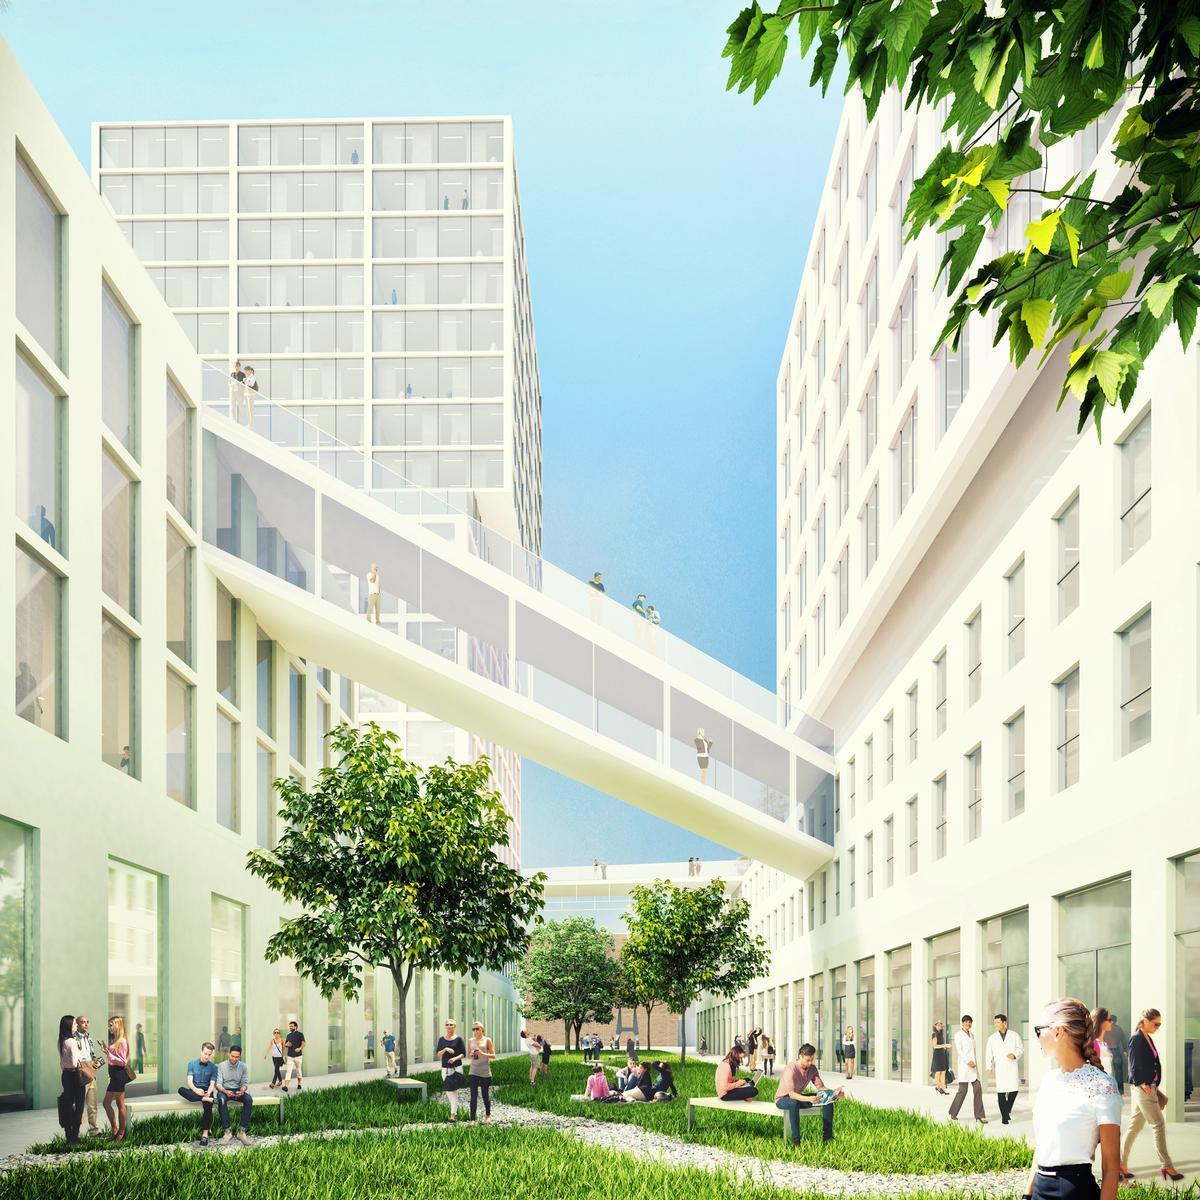 Bridges will connect the different buildings / MVRDV